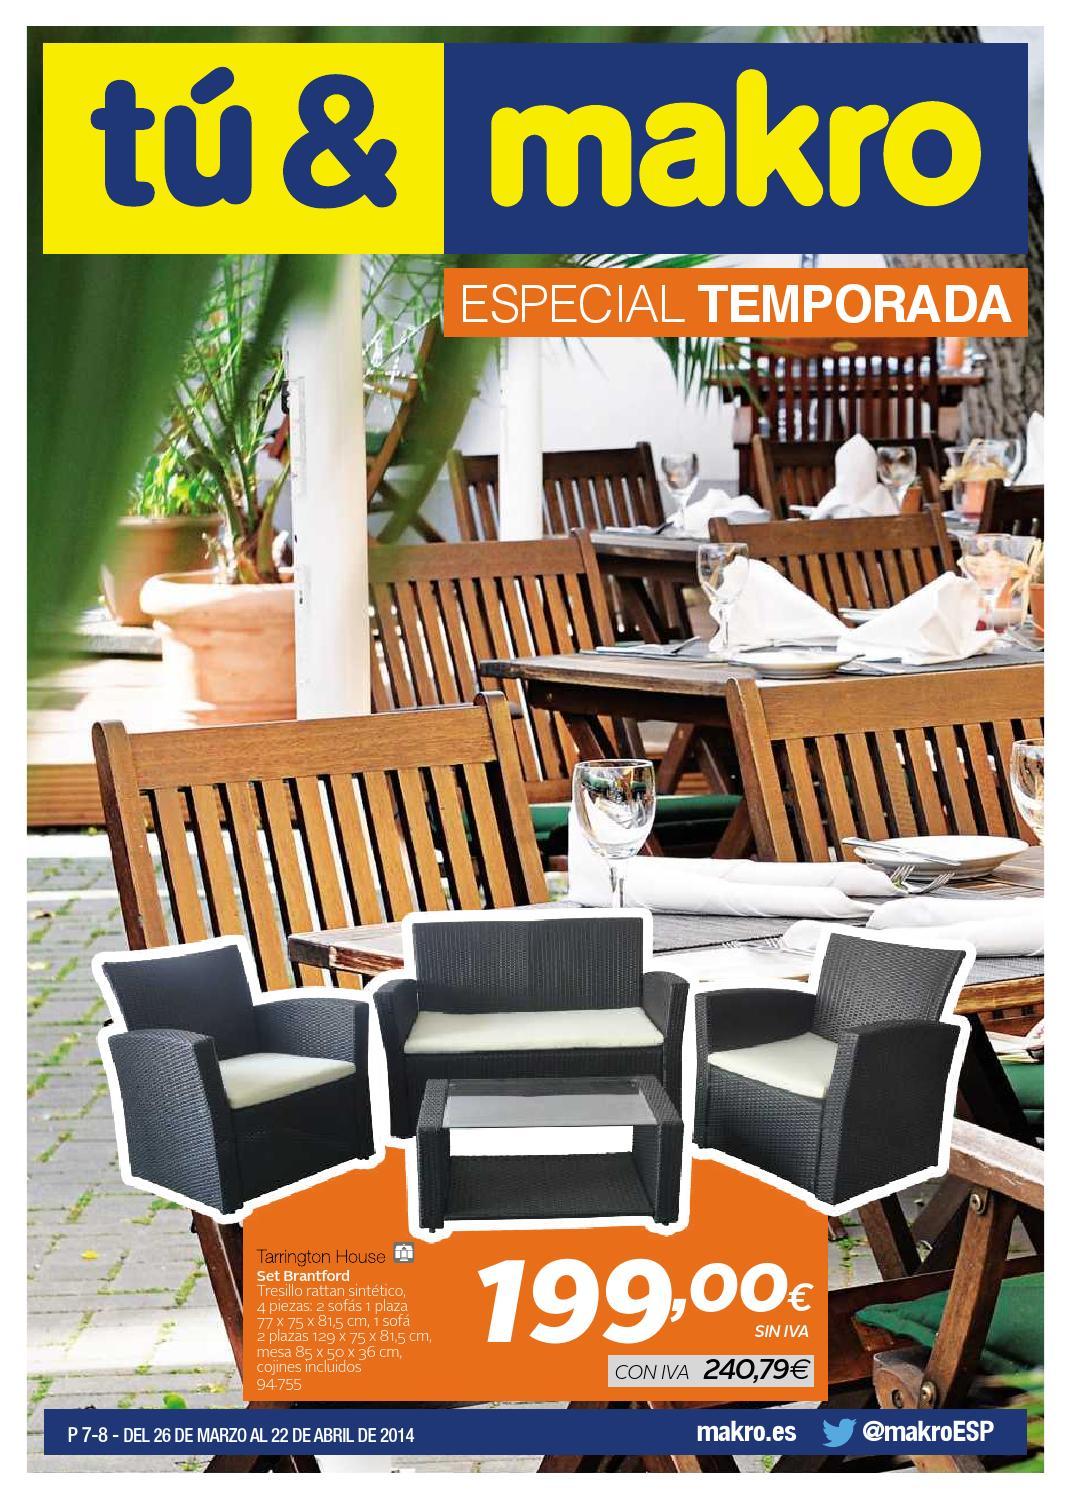 Makro espana ofertas especial temporada peninsula by for Oferta tumbonas jardin